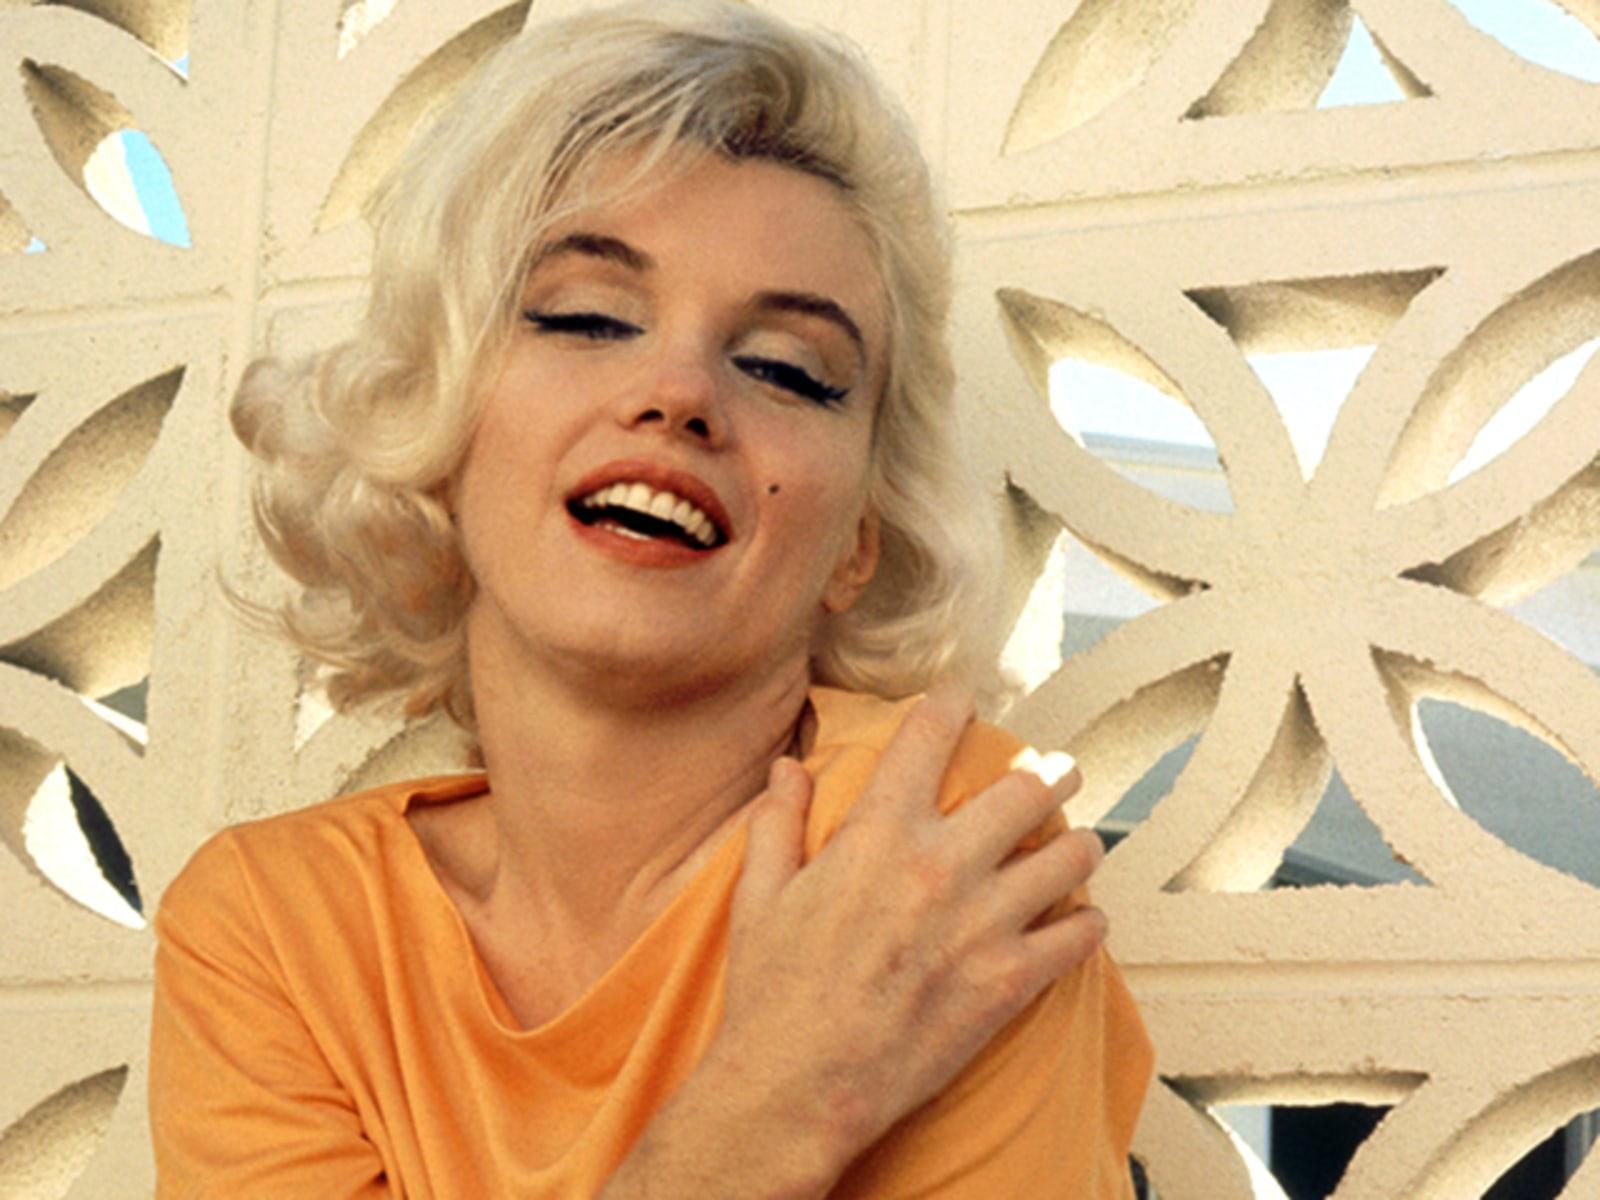 Image: Personal Property of Marilyn Monroe